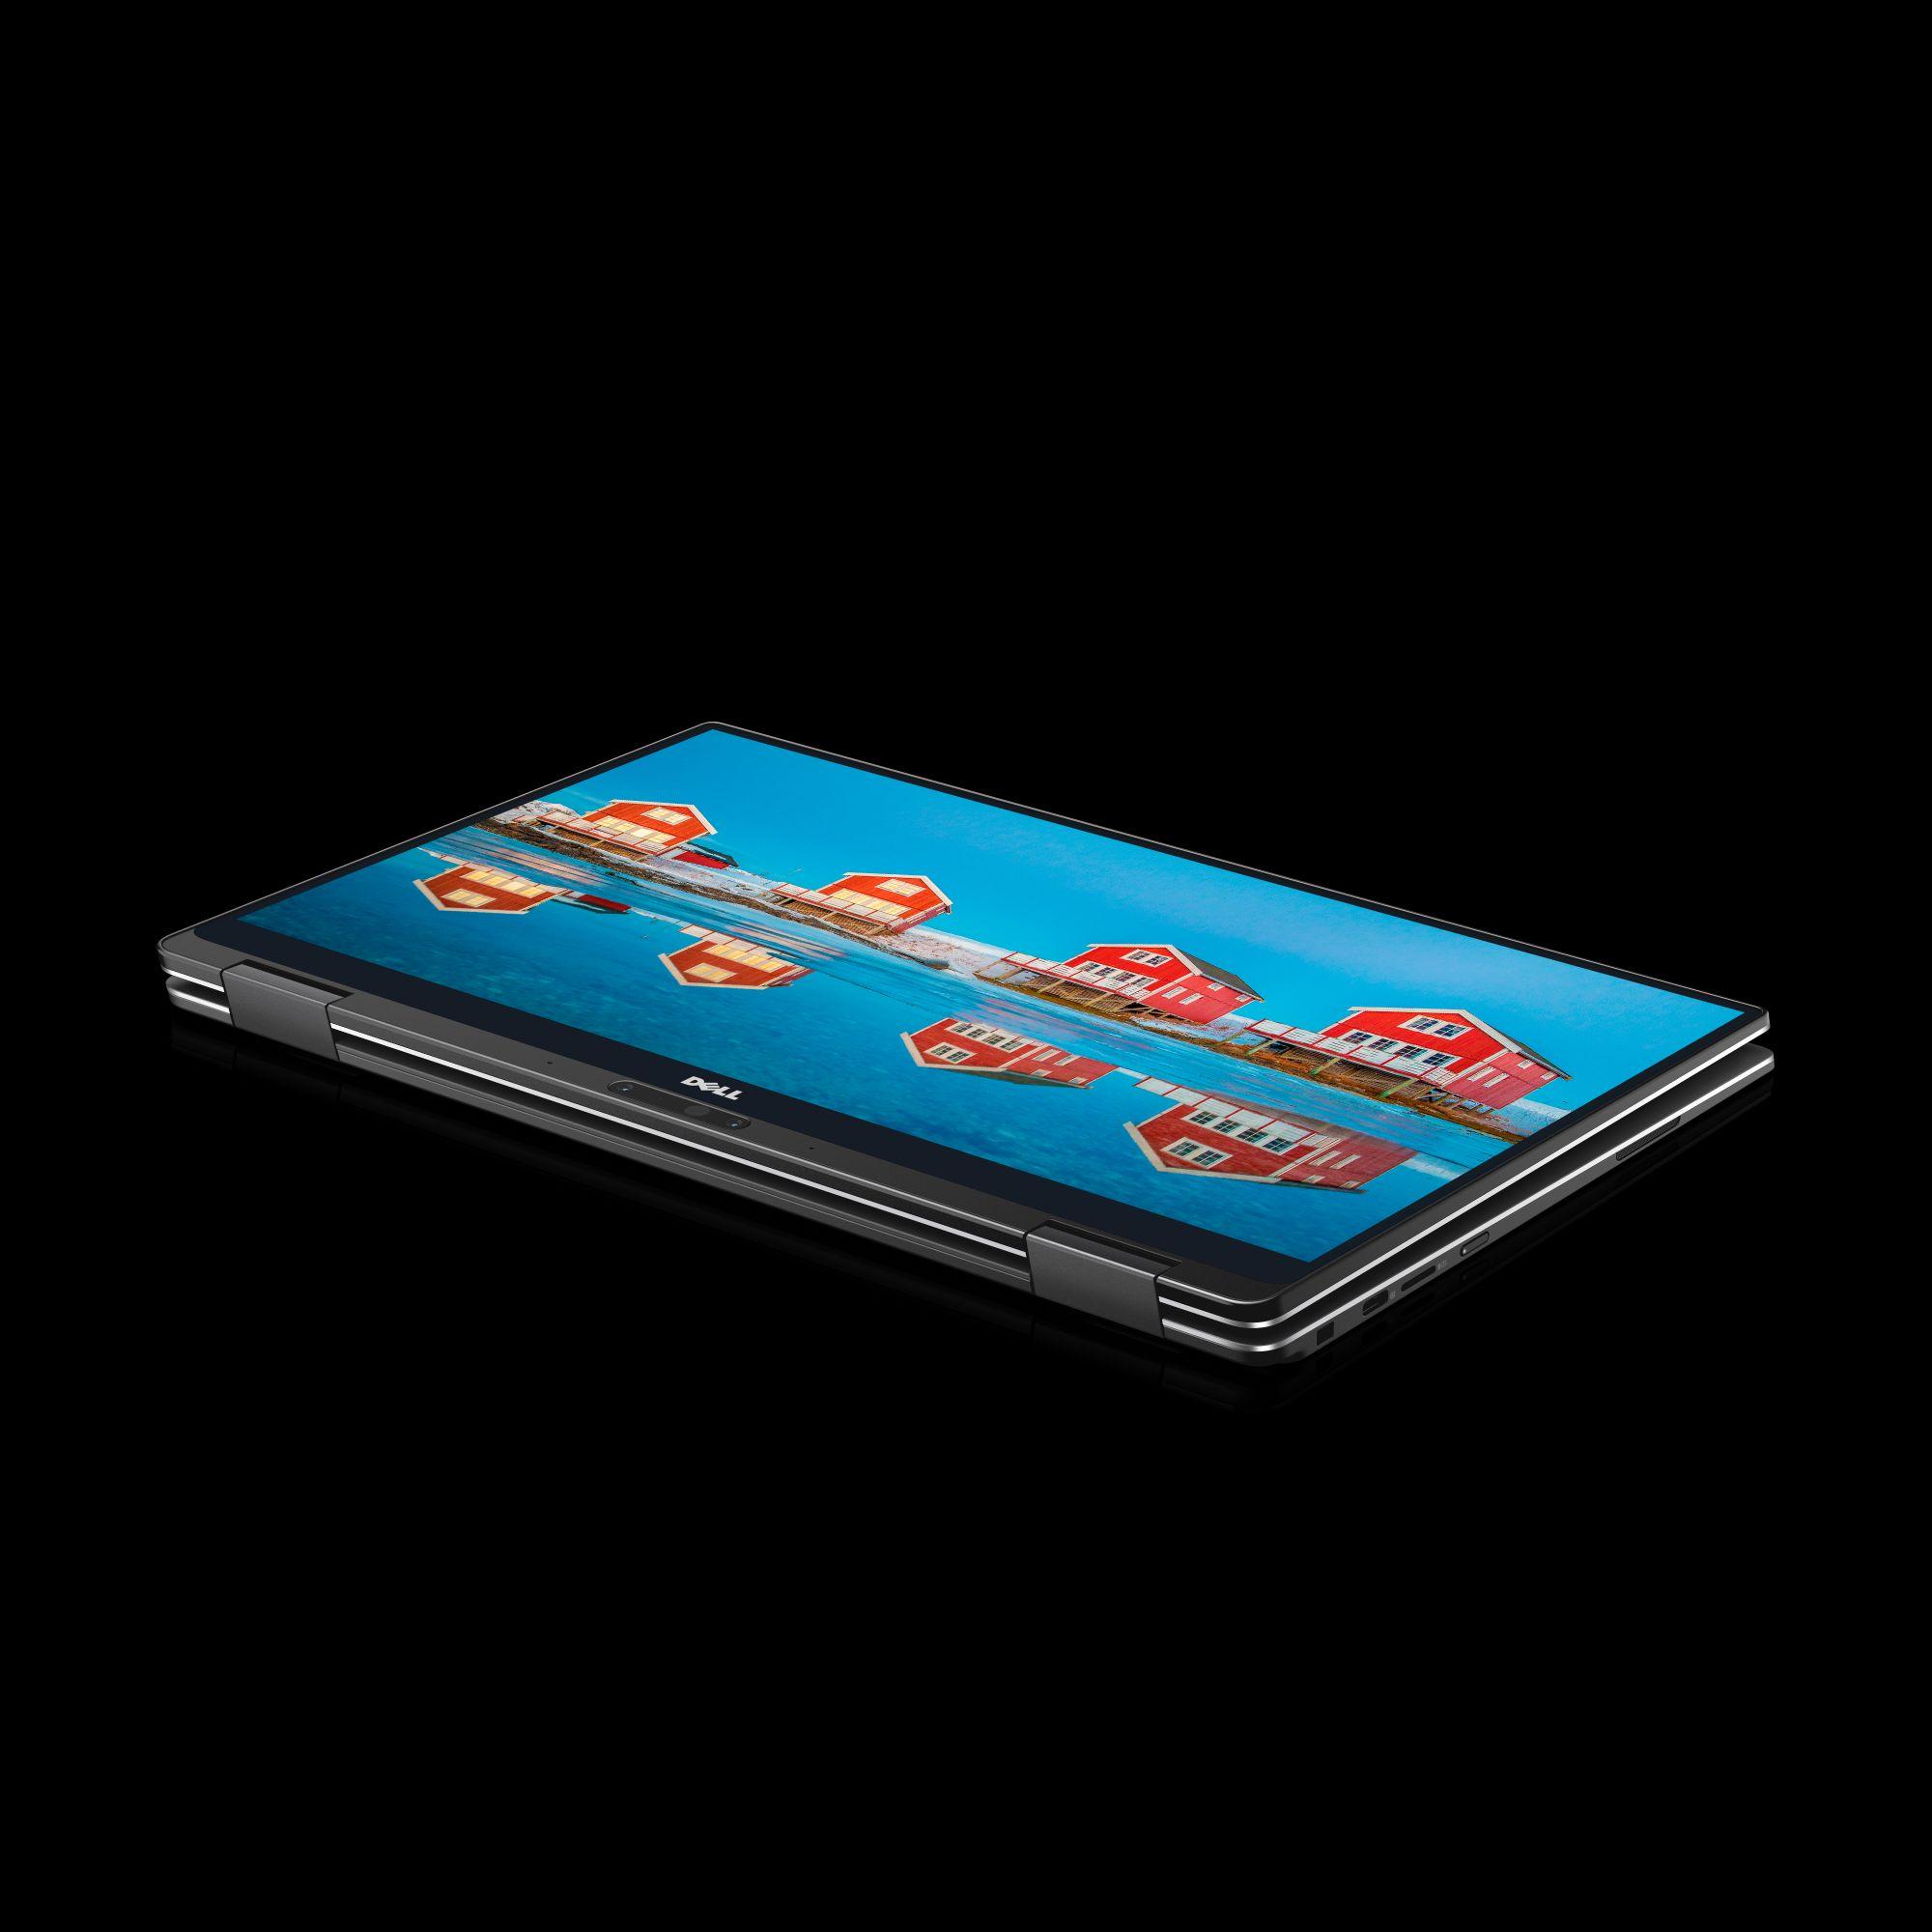 "Ноутбук Dell XPS 13 Core i7 6560U/8Gb/256Gb SSD/13.3"" Touch QHD+/Win10 Silver"